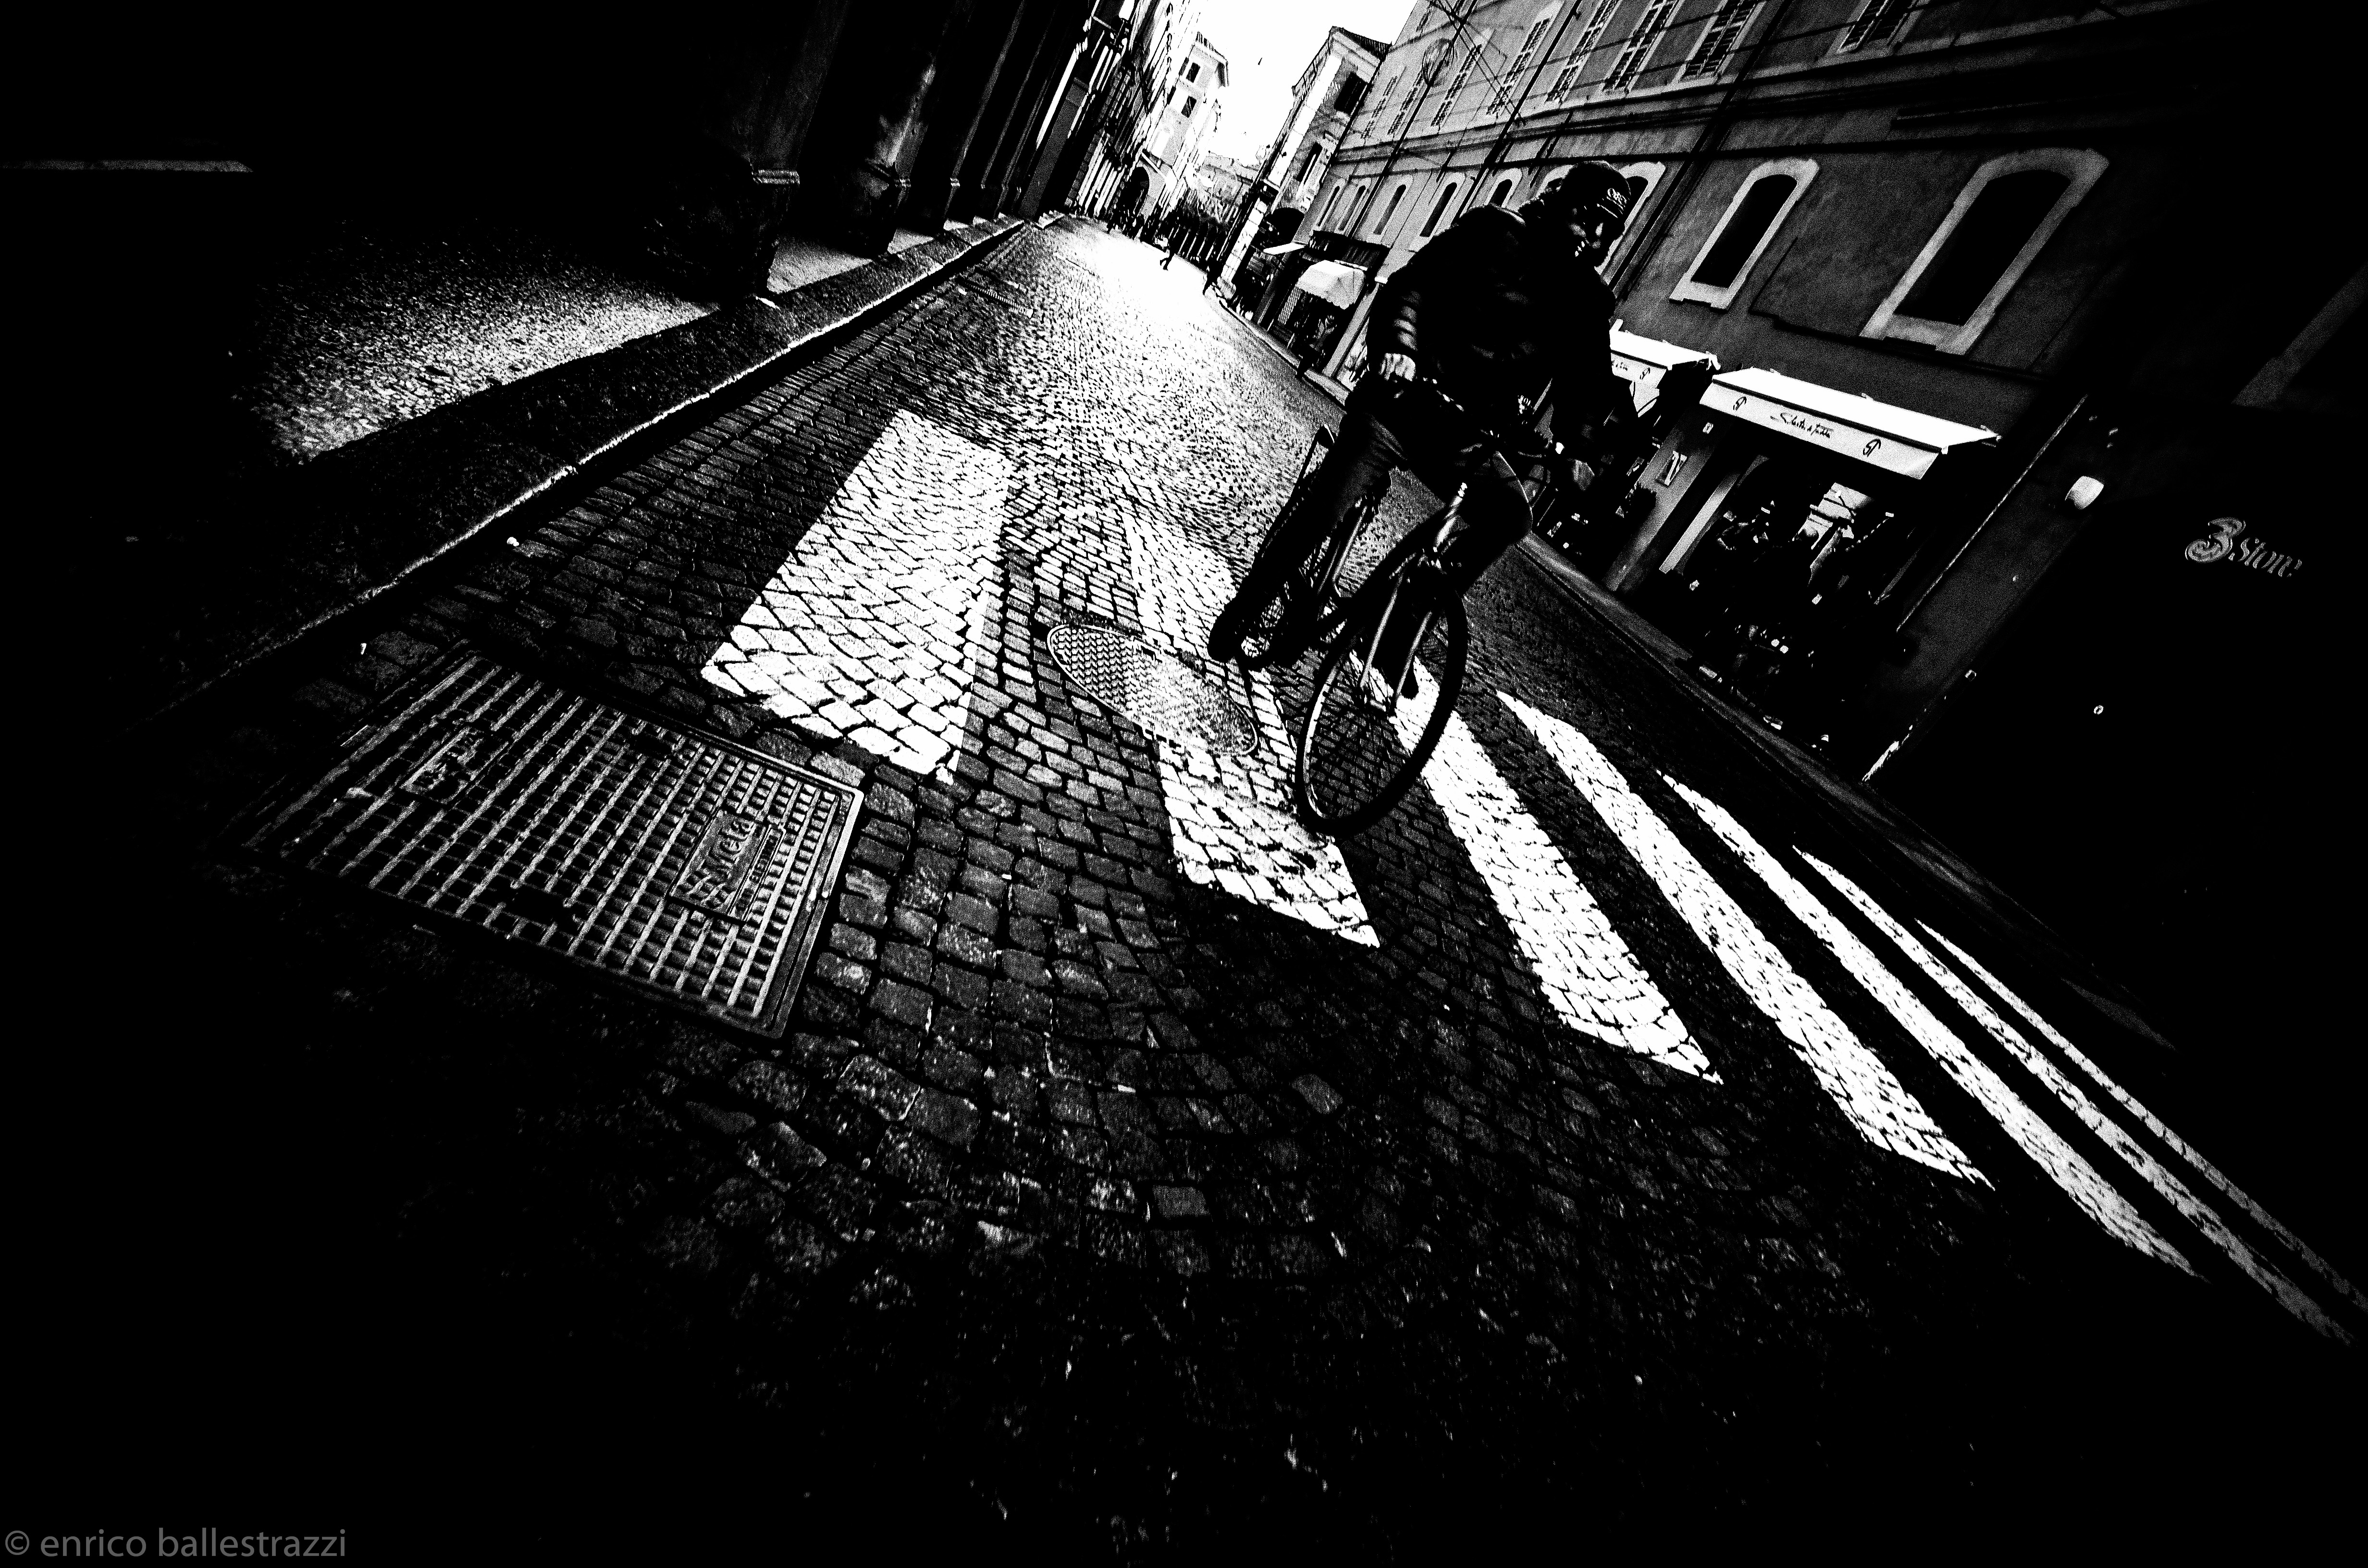 Street/enricoballestrazzi